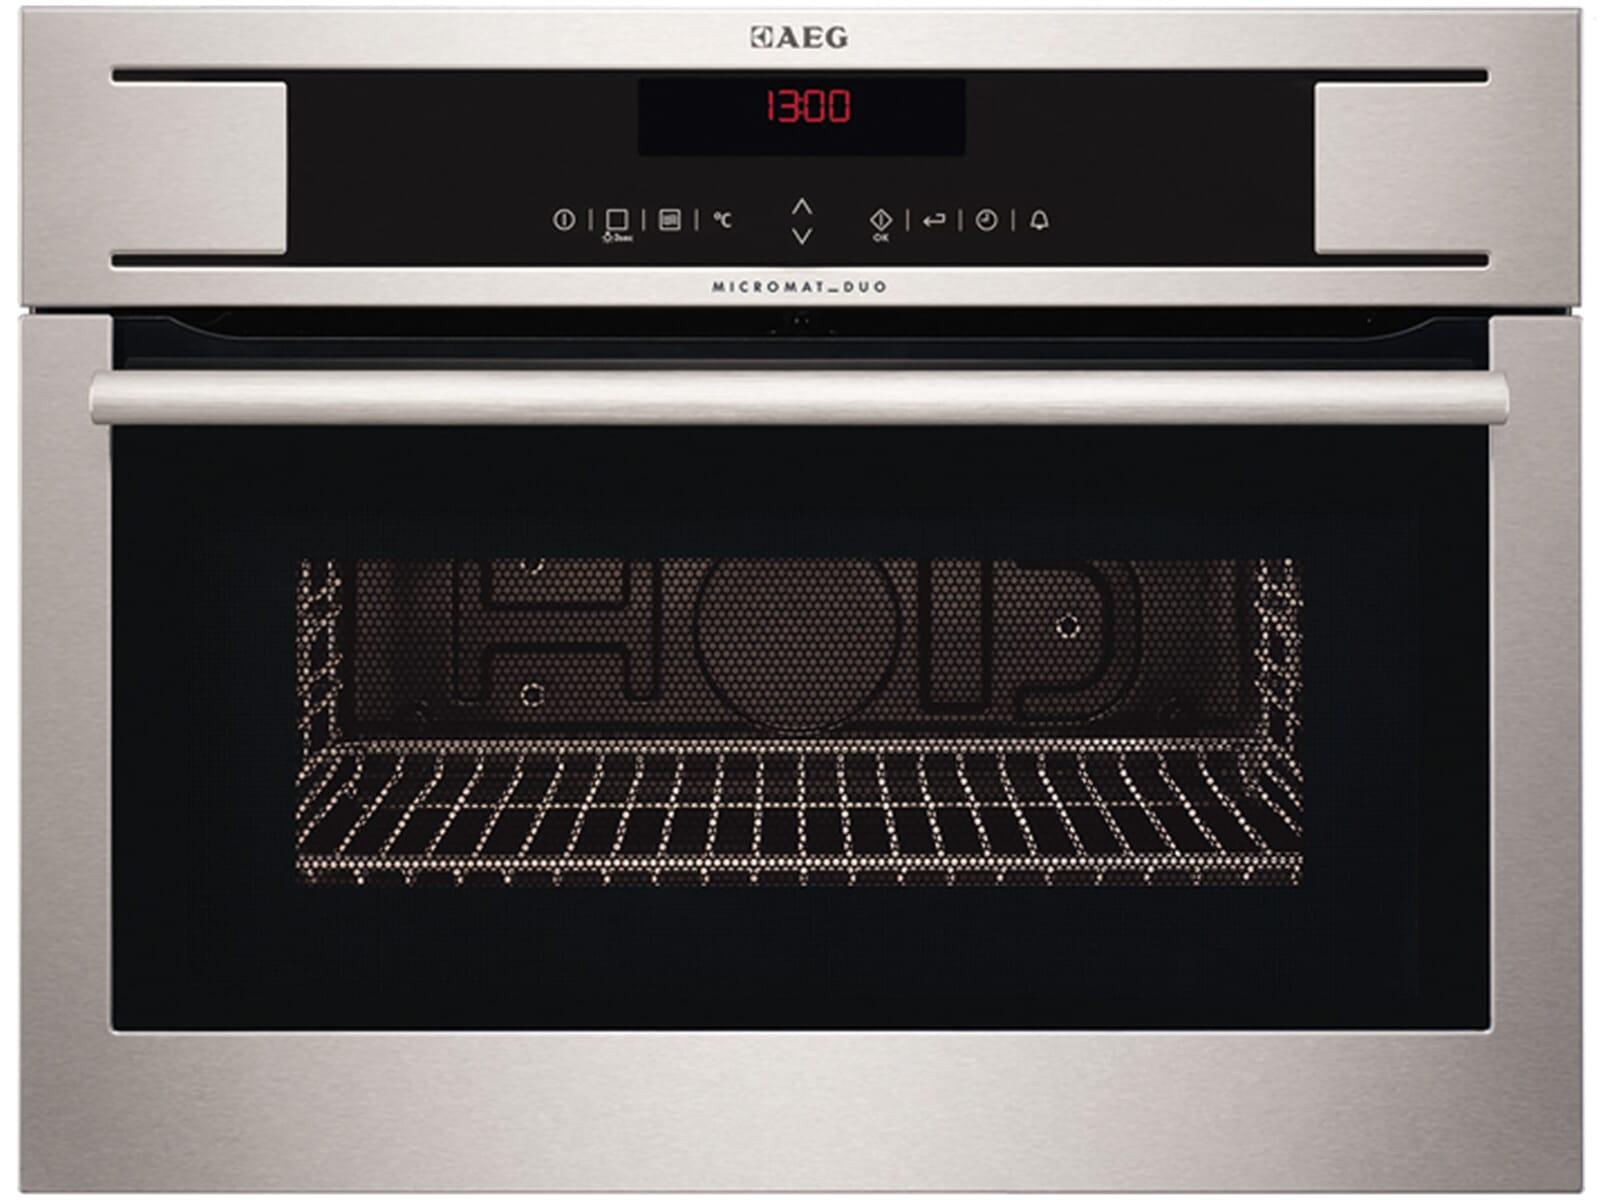 aeg kr8403101m kompakt mikrowelle mit grill edelstahl mikrowellenofen 46l einbau ebay. Black Bedroom Furniture Sets. Home Design Ideas